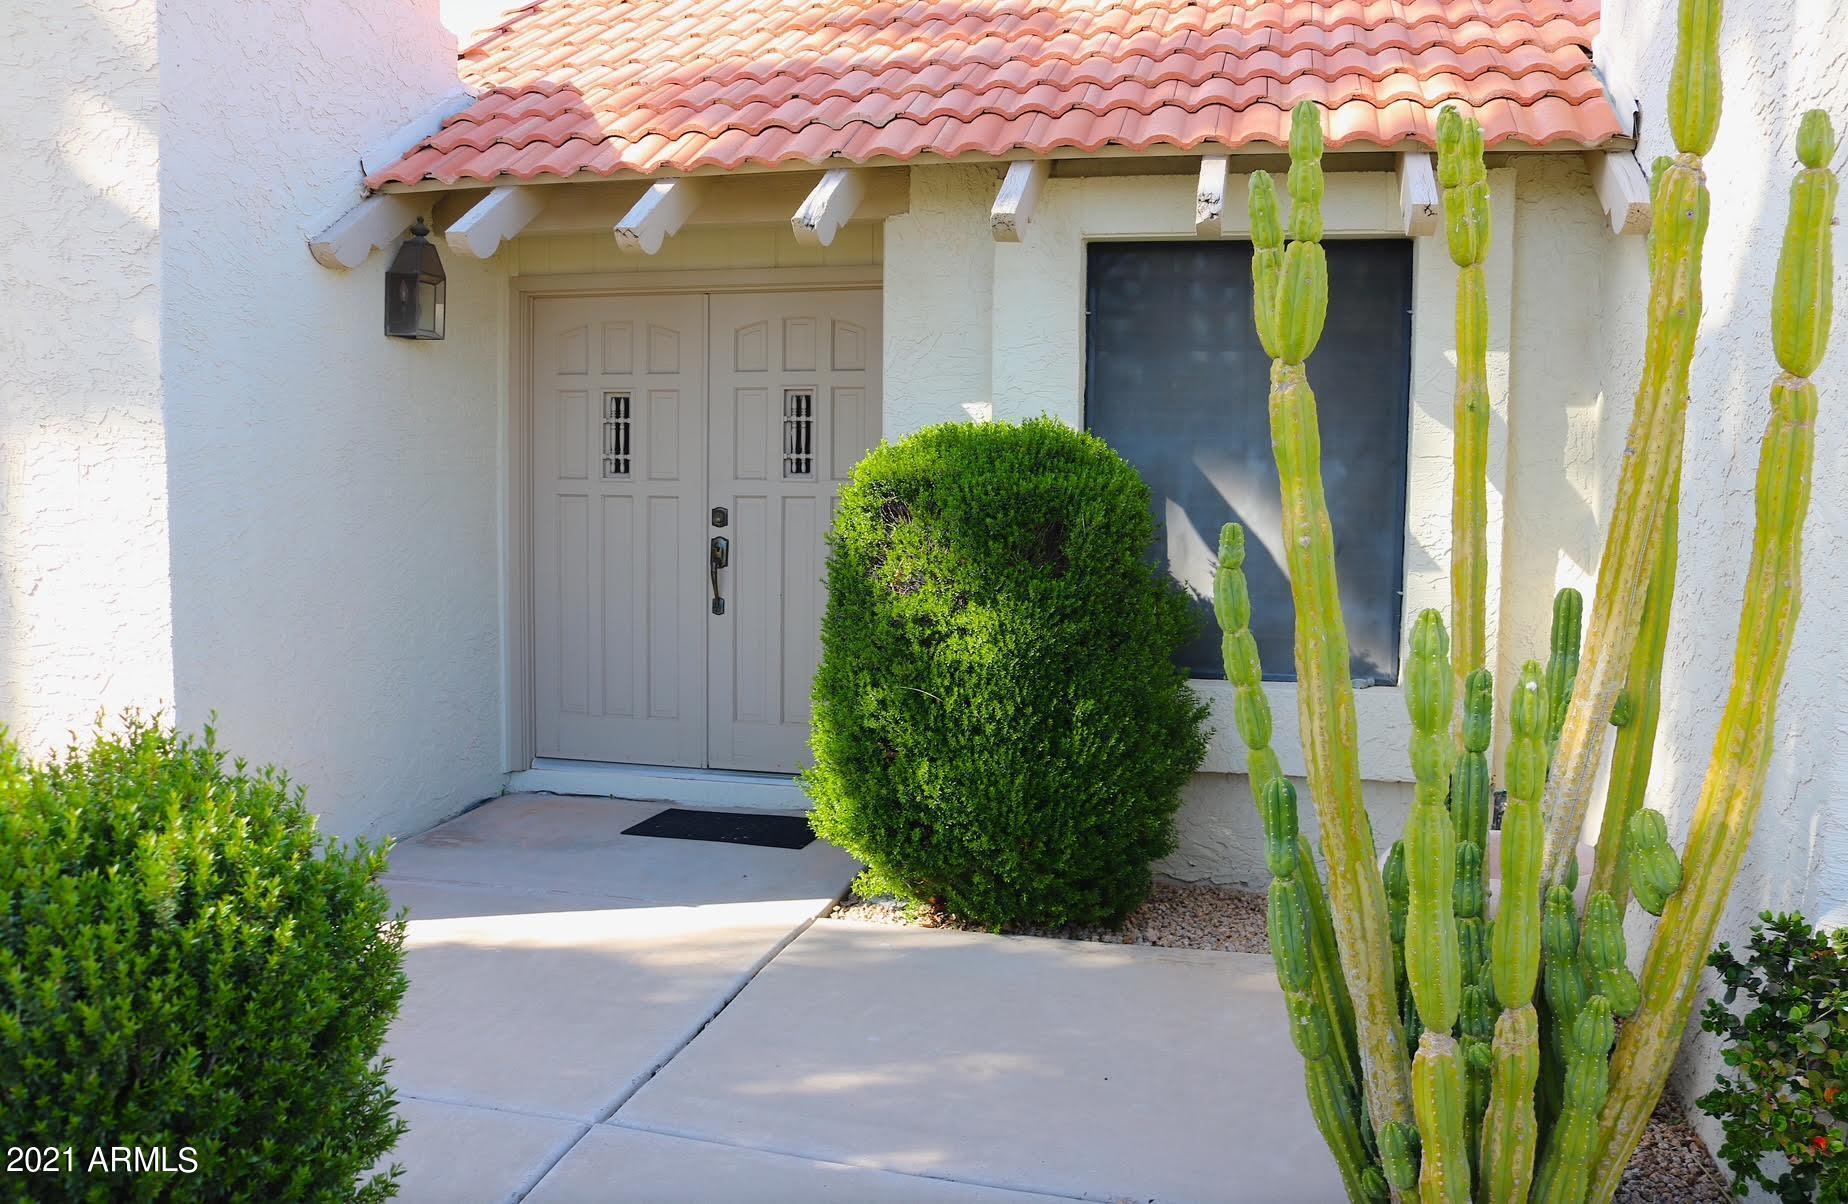 642 STERLING Place, Chandler, Arizona 85225, 4 Bedrooms Bedrooms, ,2 BathroomsBathrooms,Residential,For Sale,STERLING,6235975